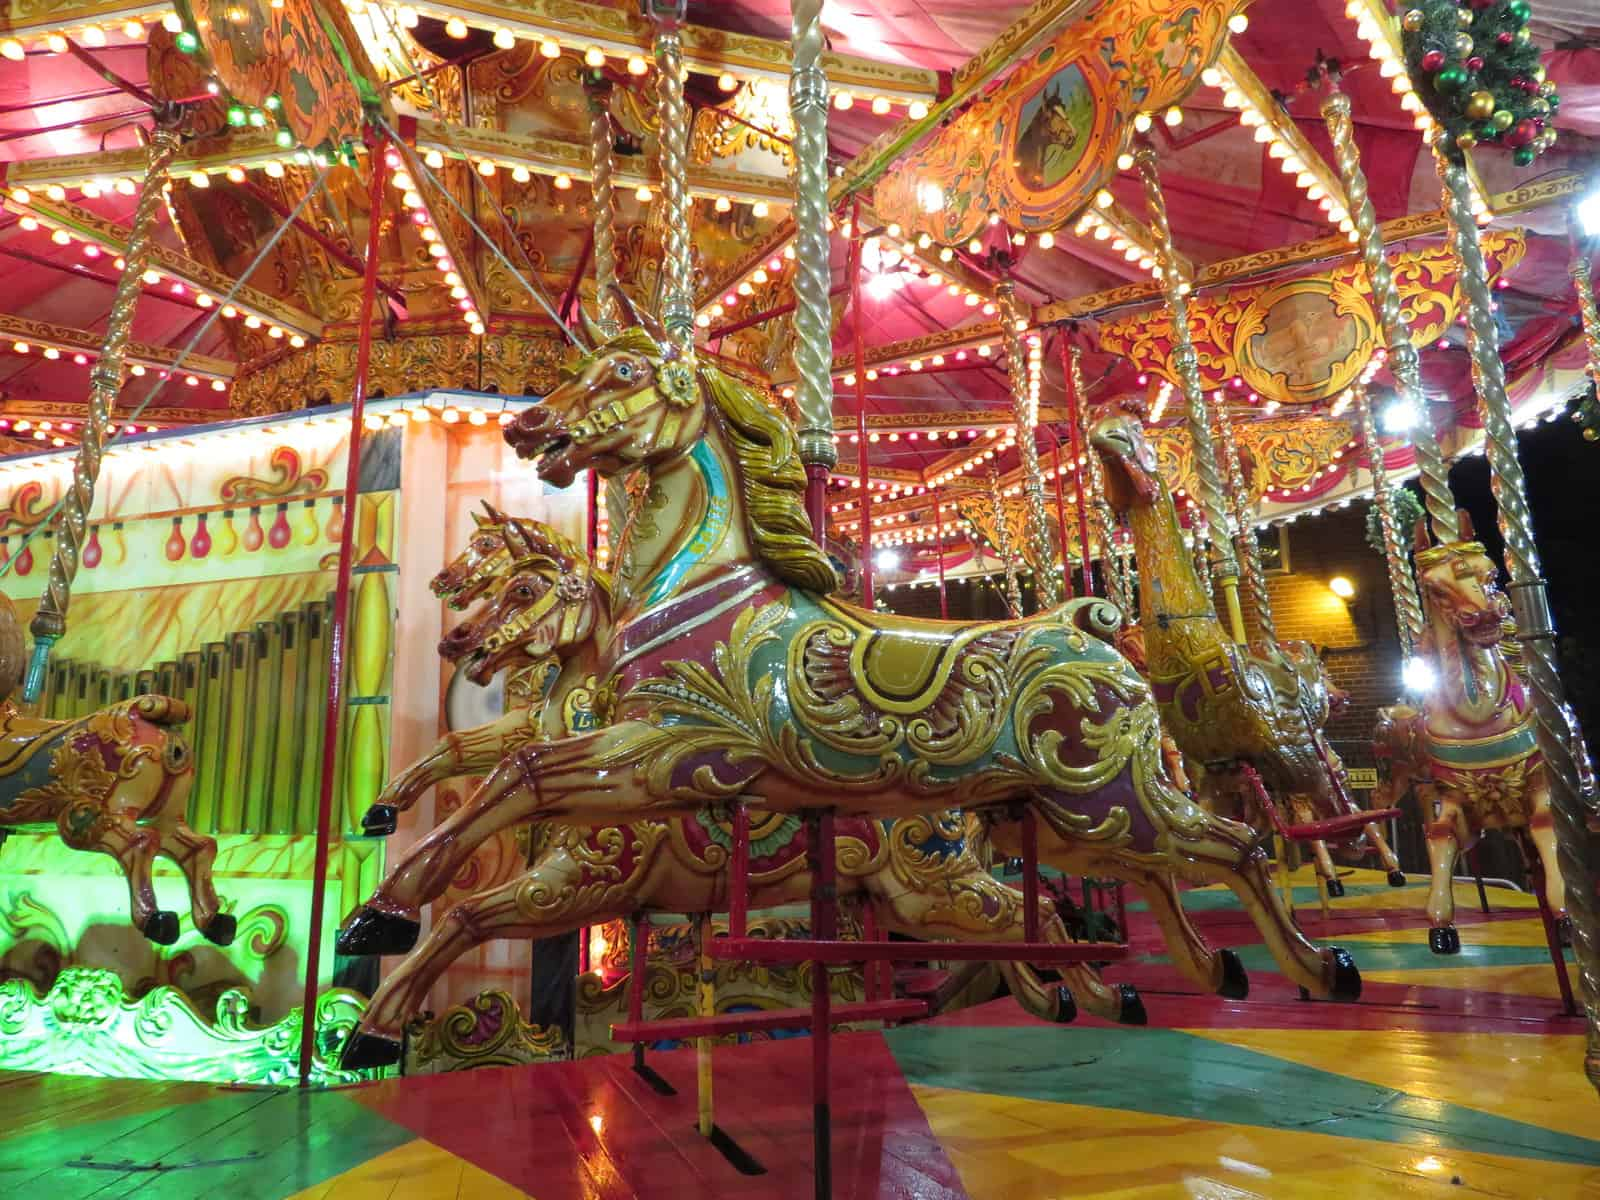 A vintage carousel